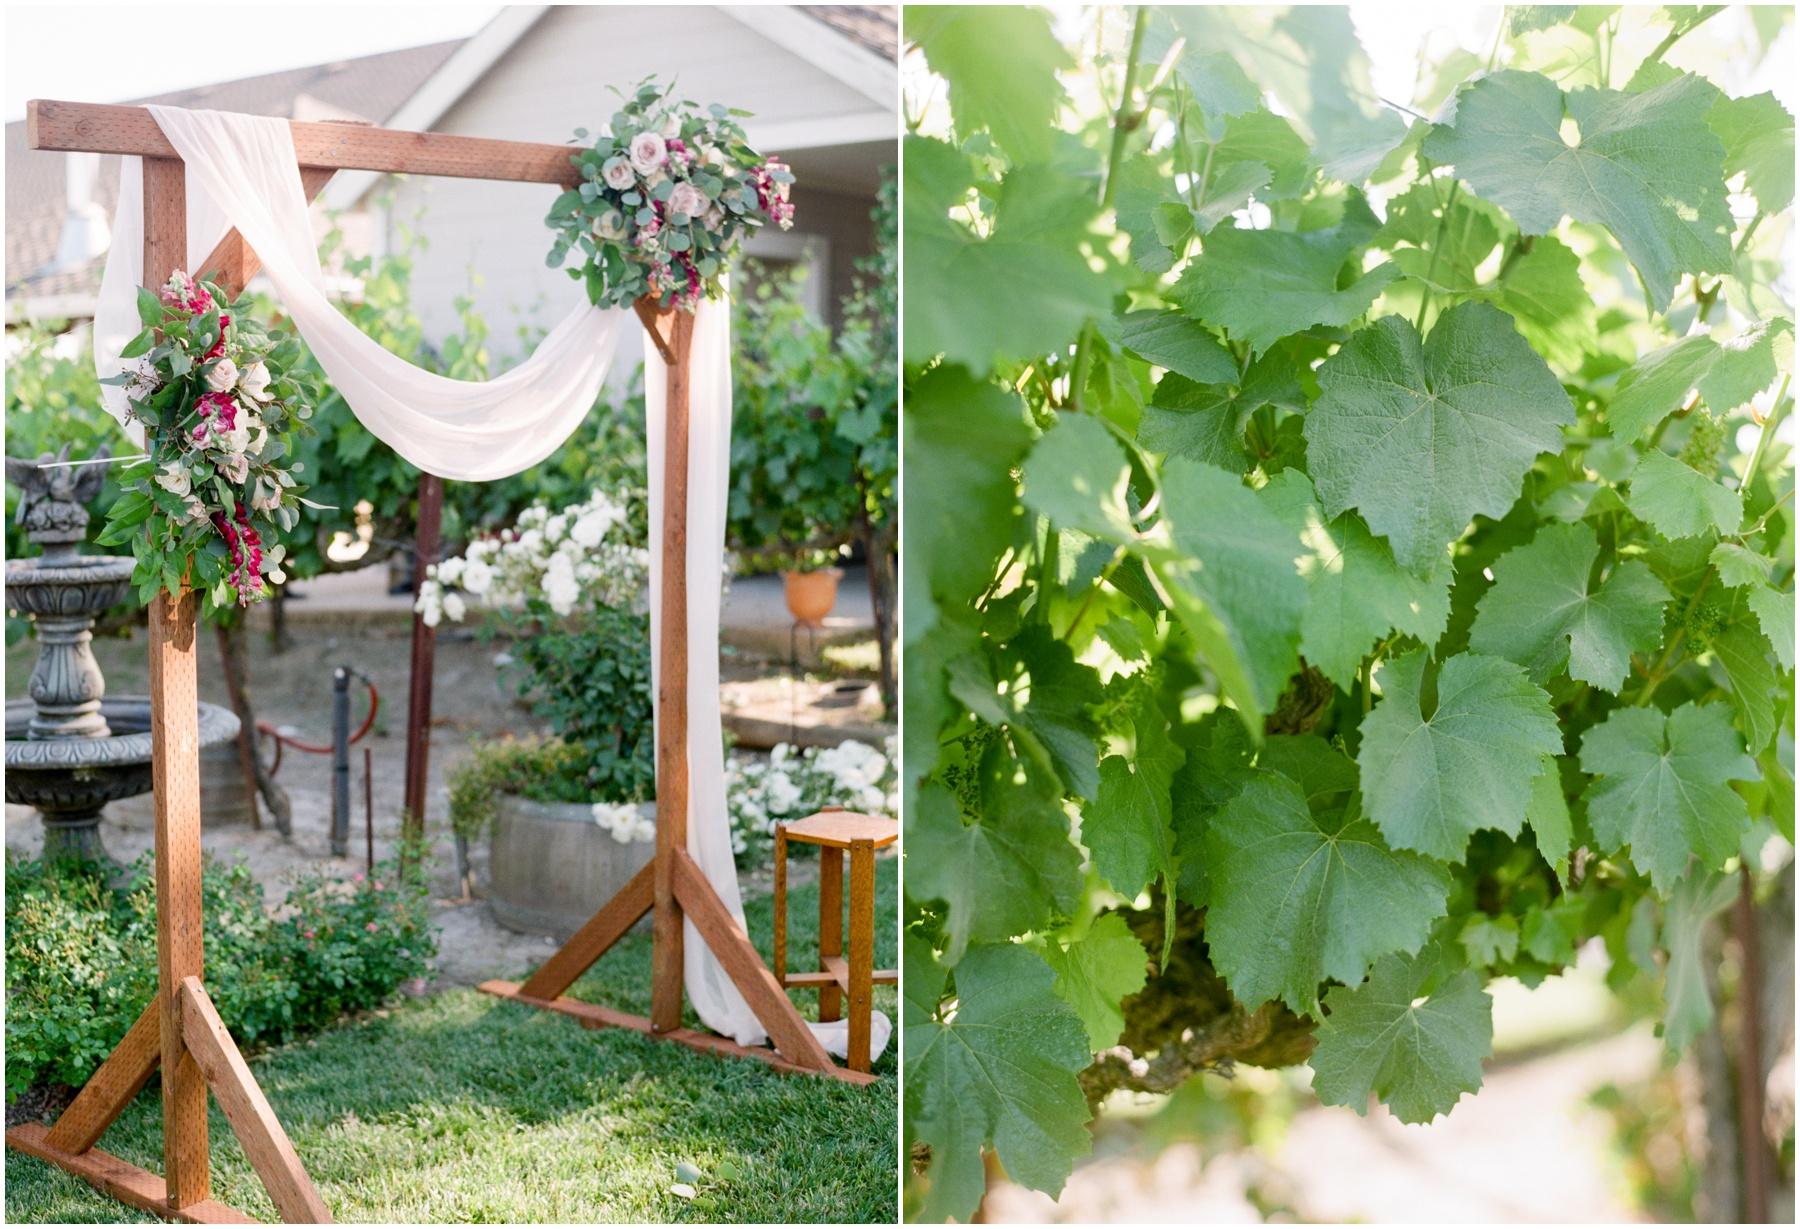 Scribner-bend-vineyards-wedding-sacramento-california-Kristine-Herman-Photography-27-1.jpg